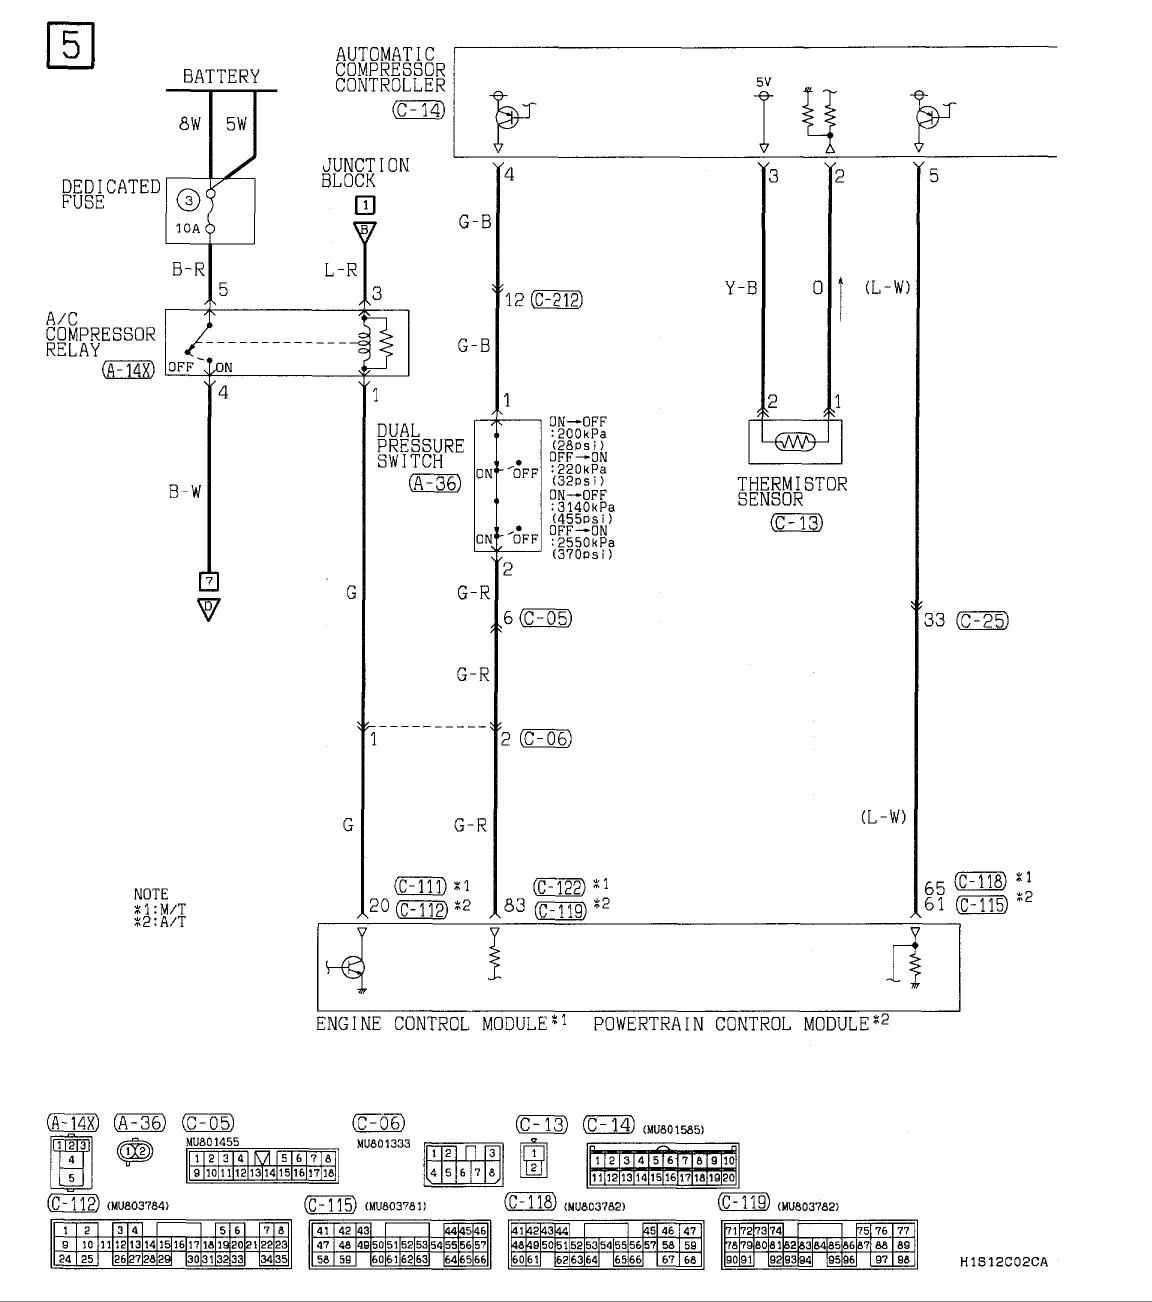 Awesome Mitsubishi Eclipse Ac Diagram Blog Diagram Schema Wiring Cloud Lukepaidewilluminateatxorg